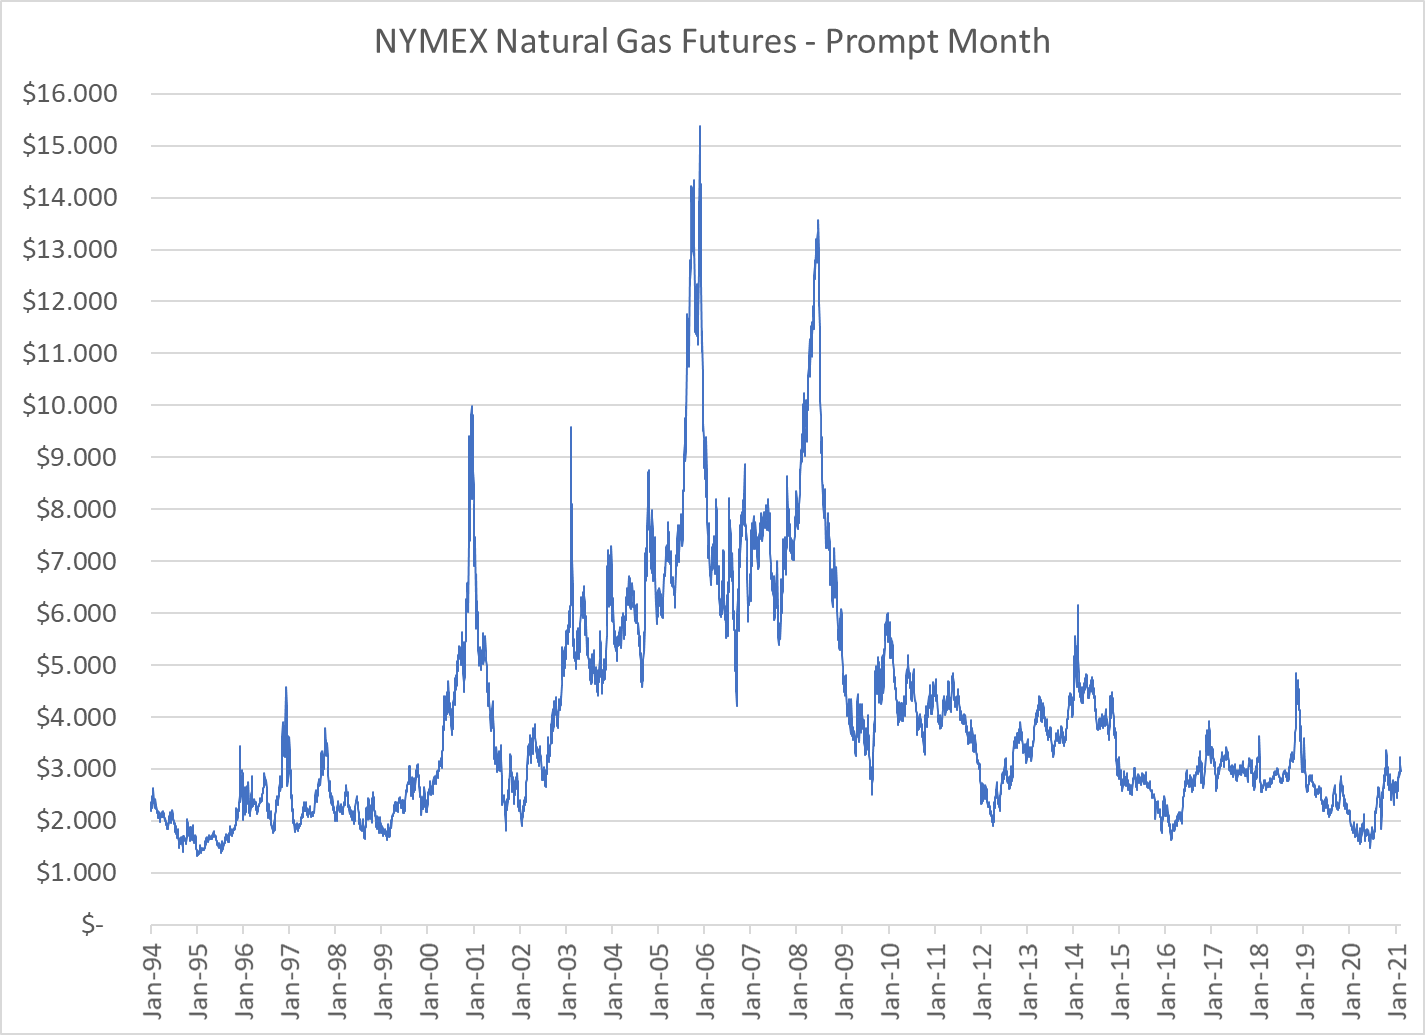 NYMEX-natural-gas-futures-historical-chart-1